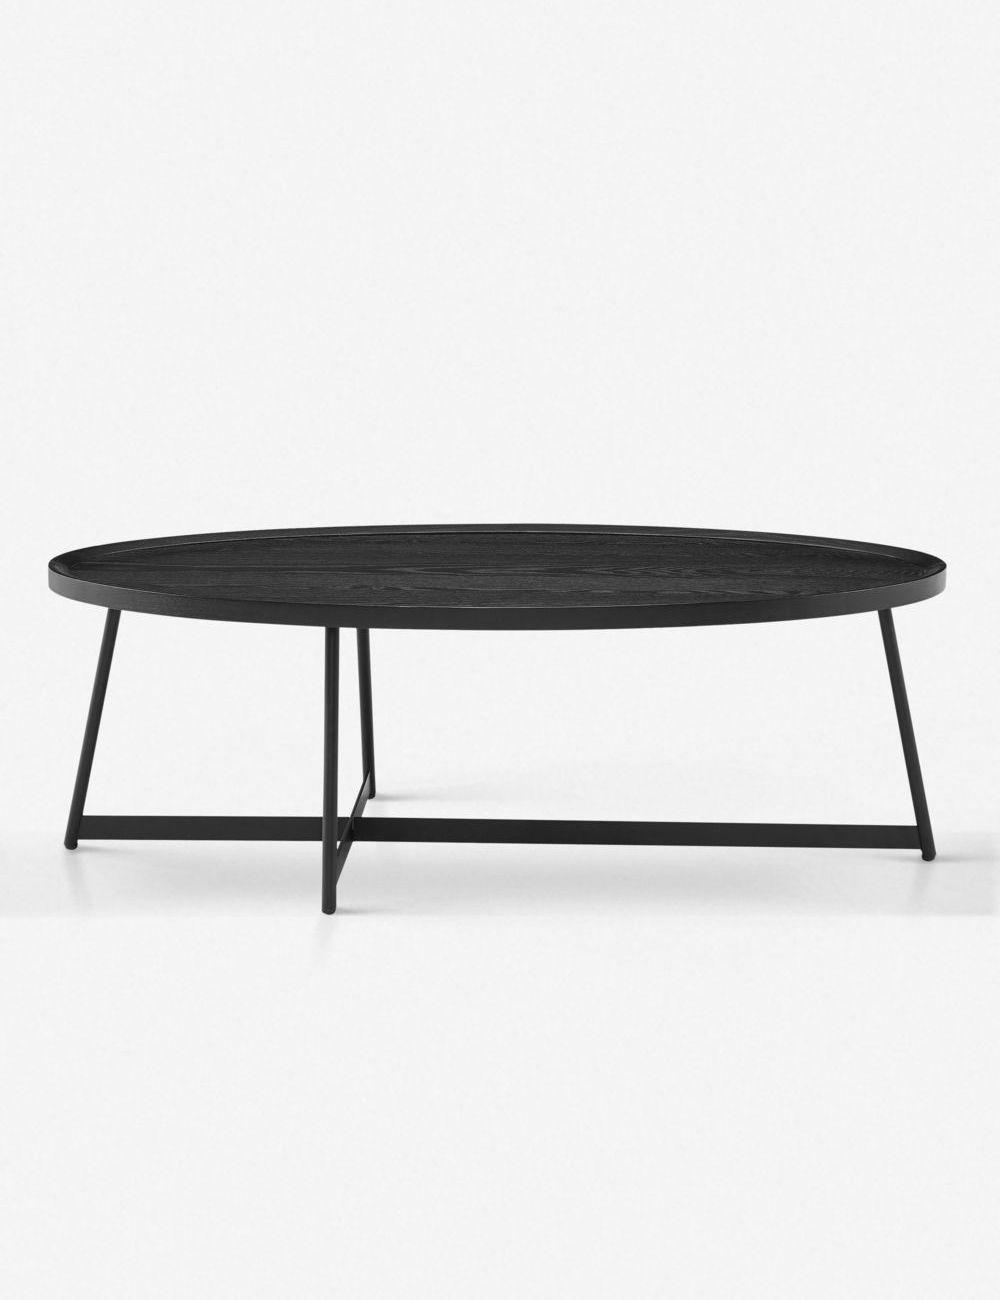 Gweneth Oval Coffee Table Black Ash In 2021 Coffee Table Oval Coffee Tables Black Living Room Table [ 1300 x 1000 Pixel ]